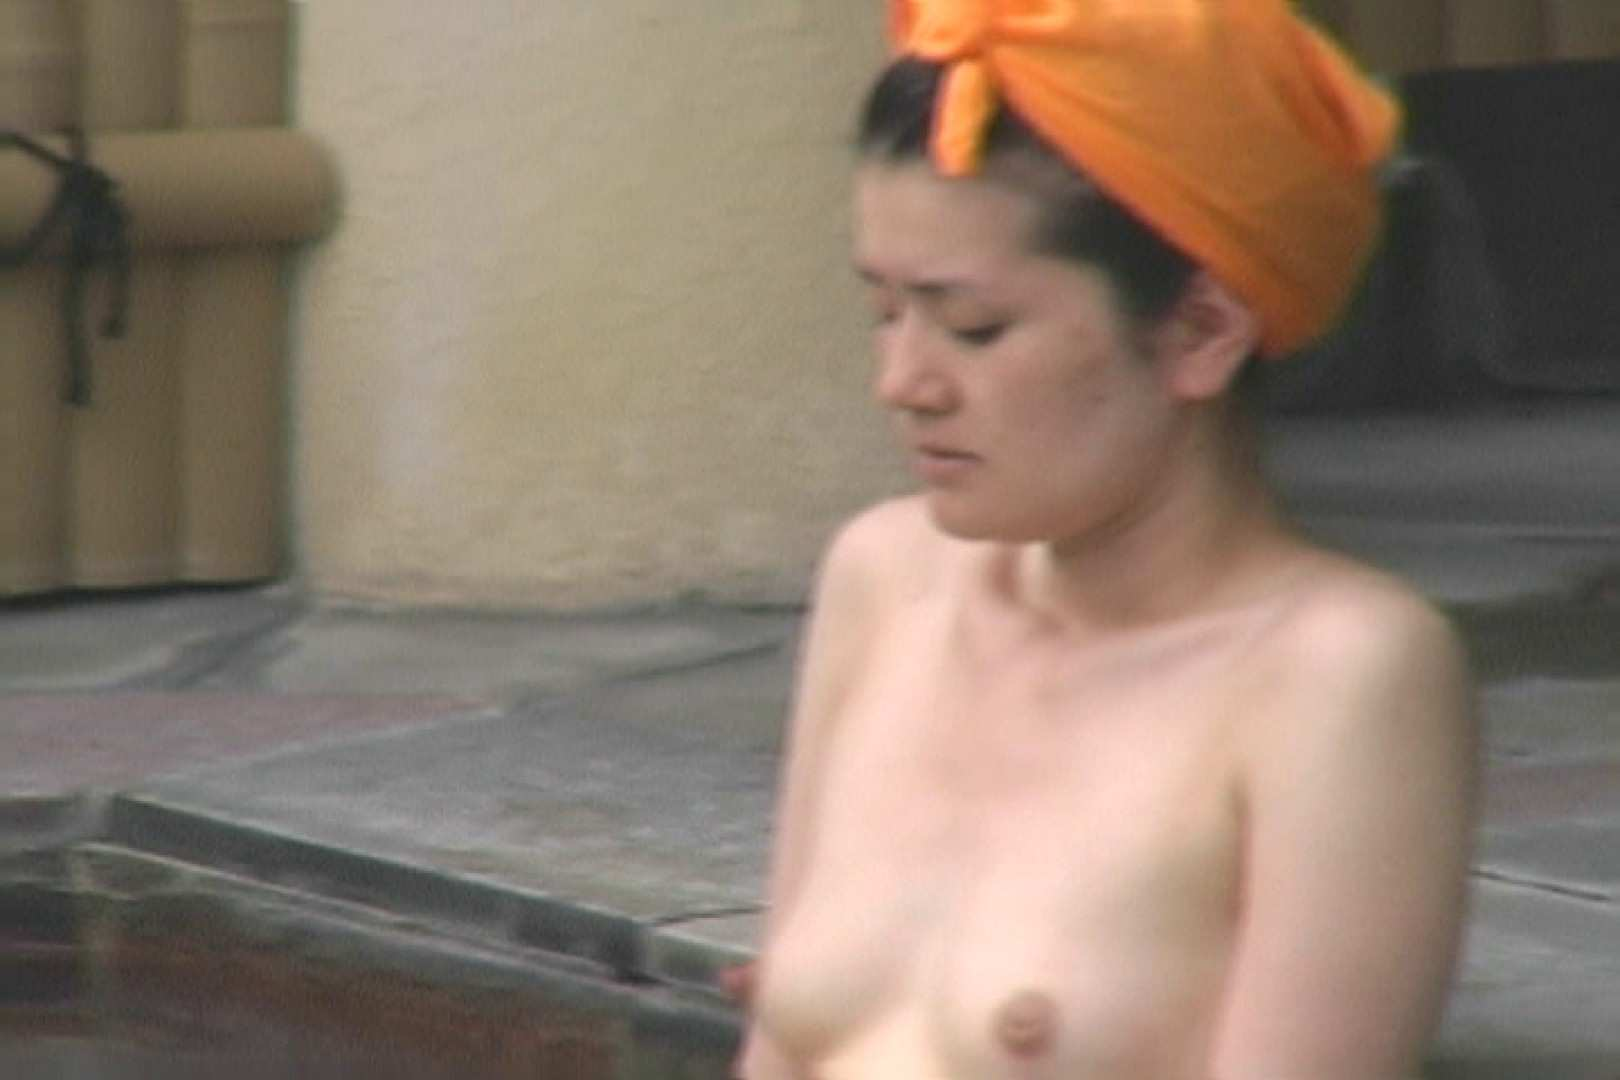 Aquaな露天風呂Vol.640 エッチな盗撮 セックス画像 101pic 26